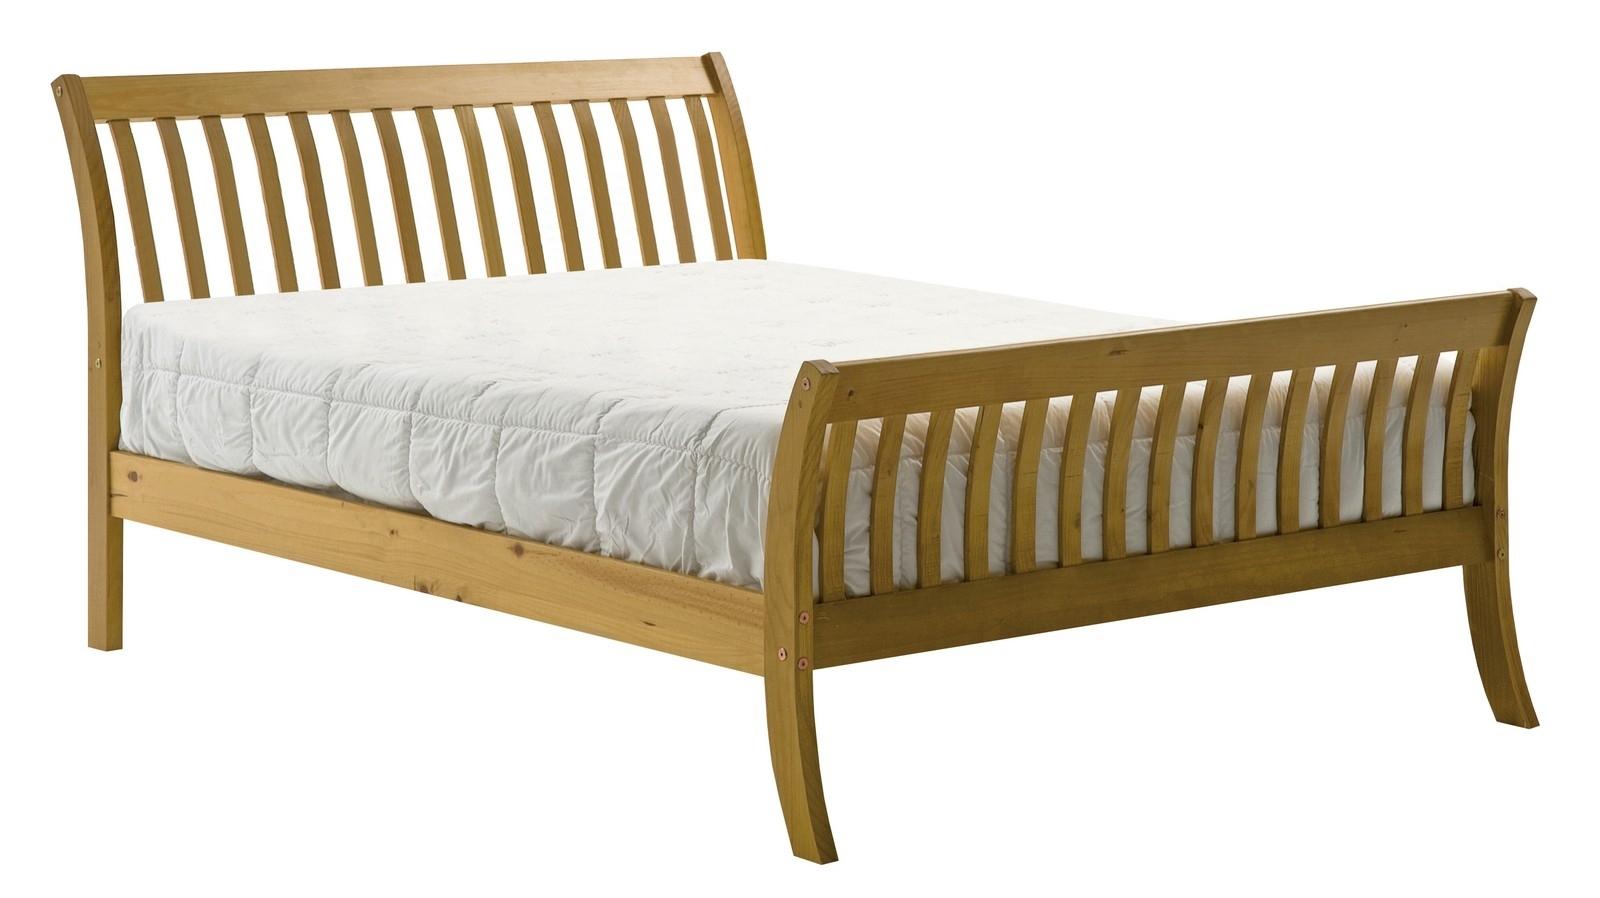 lit pin massif miel 140 x 190 cm kerta. Black Bedroom Furniture Sets. Home Design Ideas